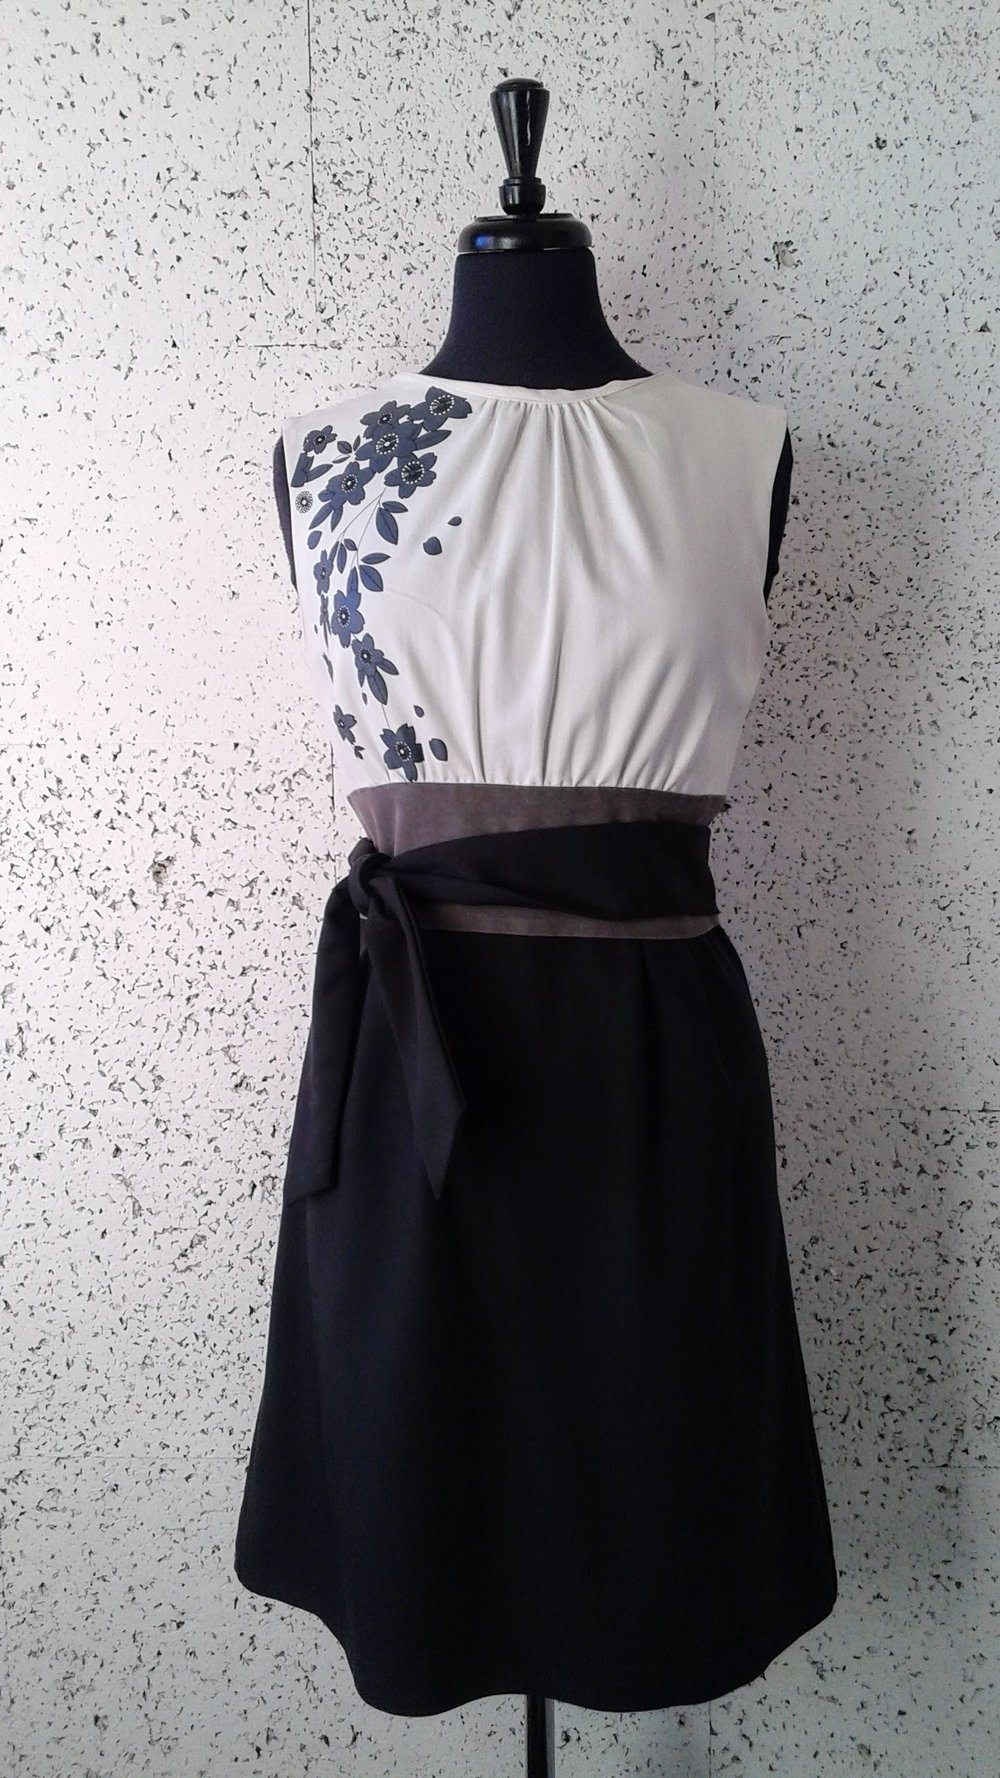 Echo Rain dress; Size M, $45